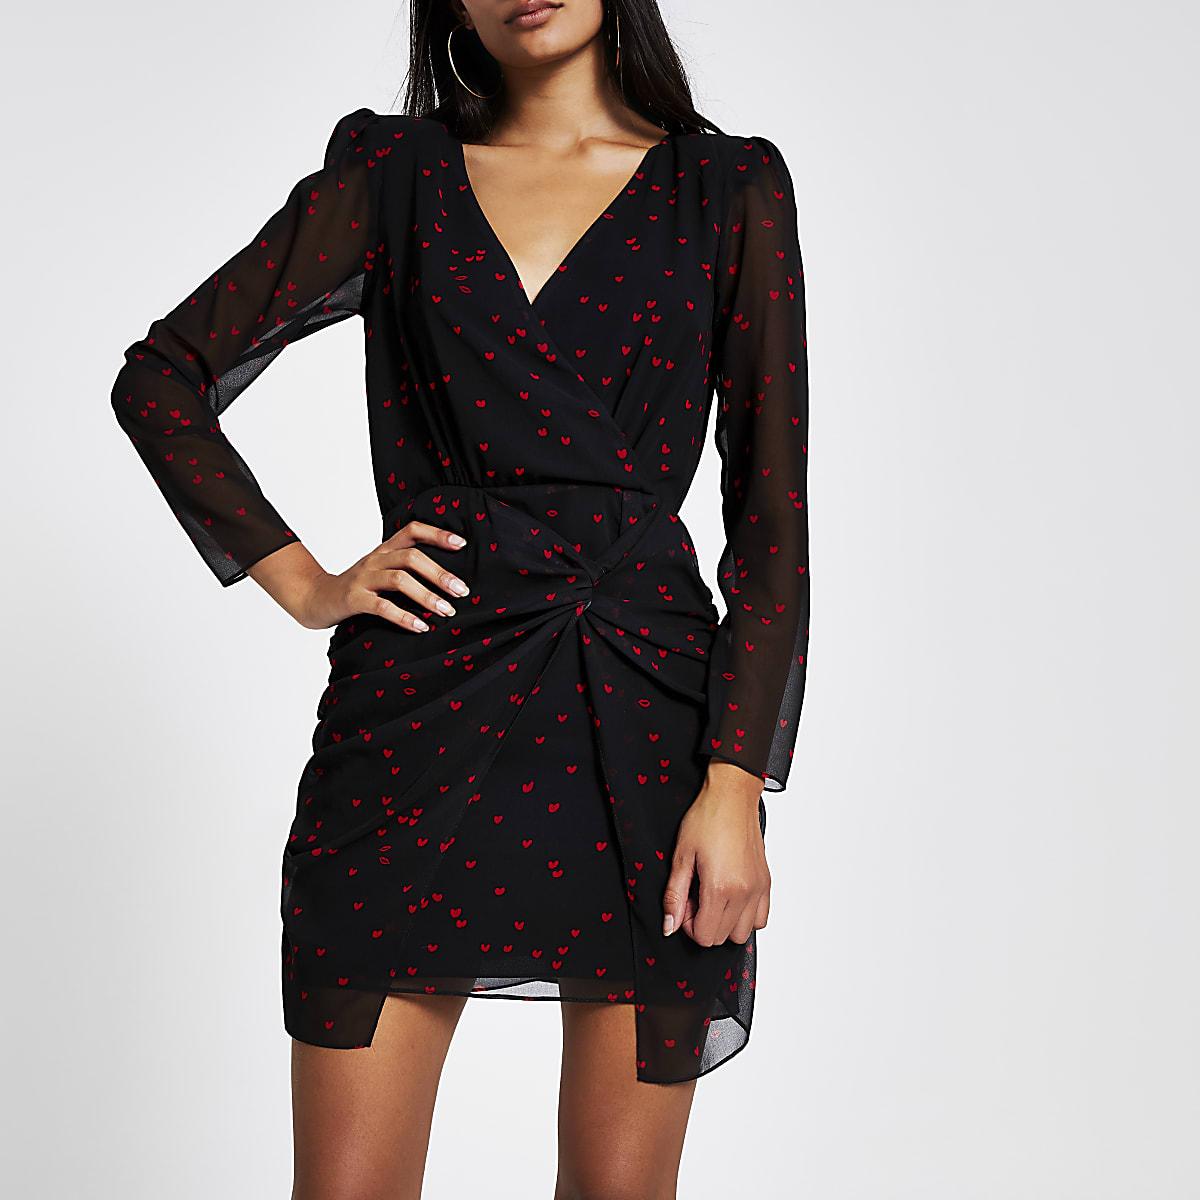 Black heart long sleeve sheer mini dress